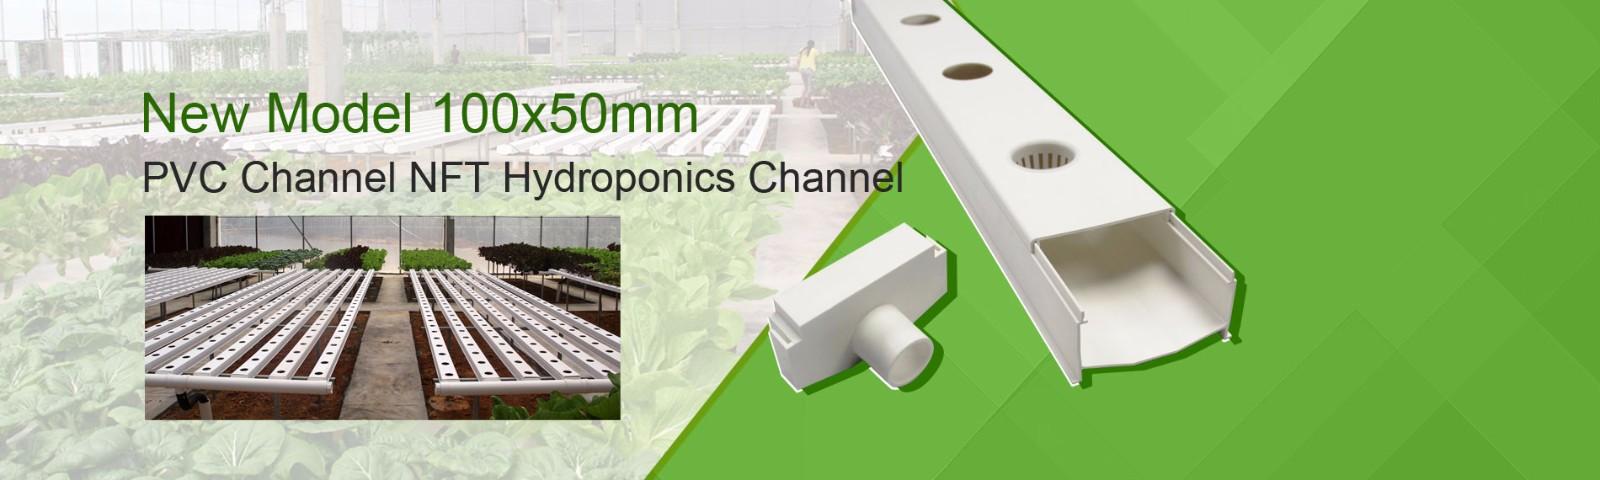 New Model 100x50mm Pvc Channel Nft Hydroponics Channel